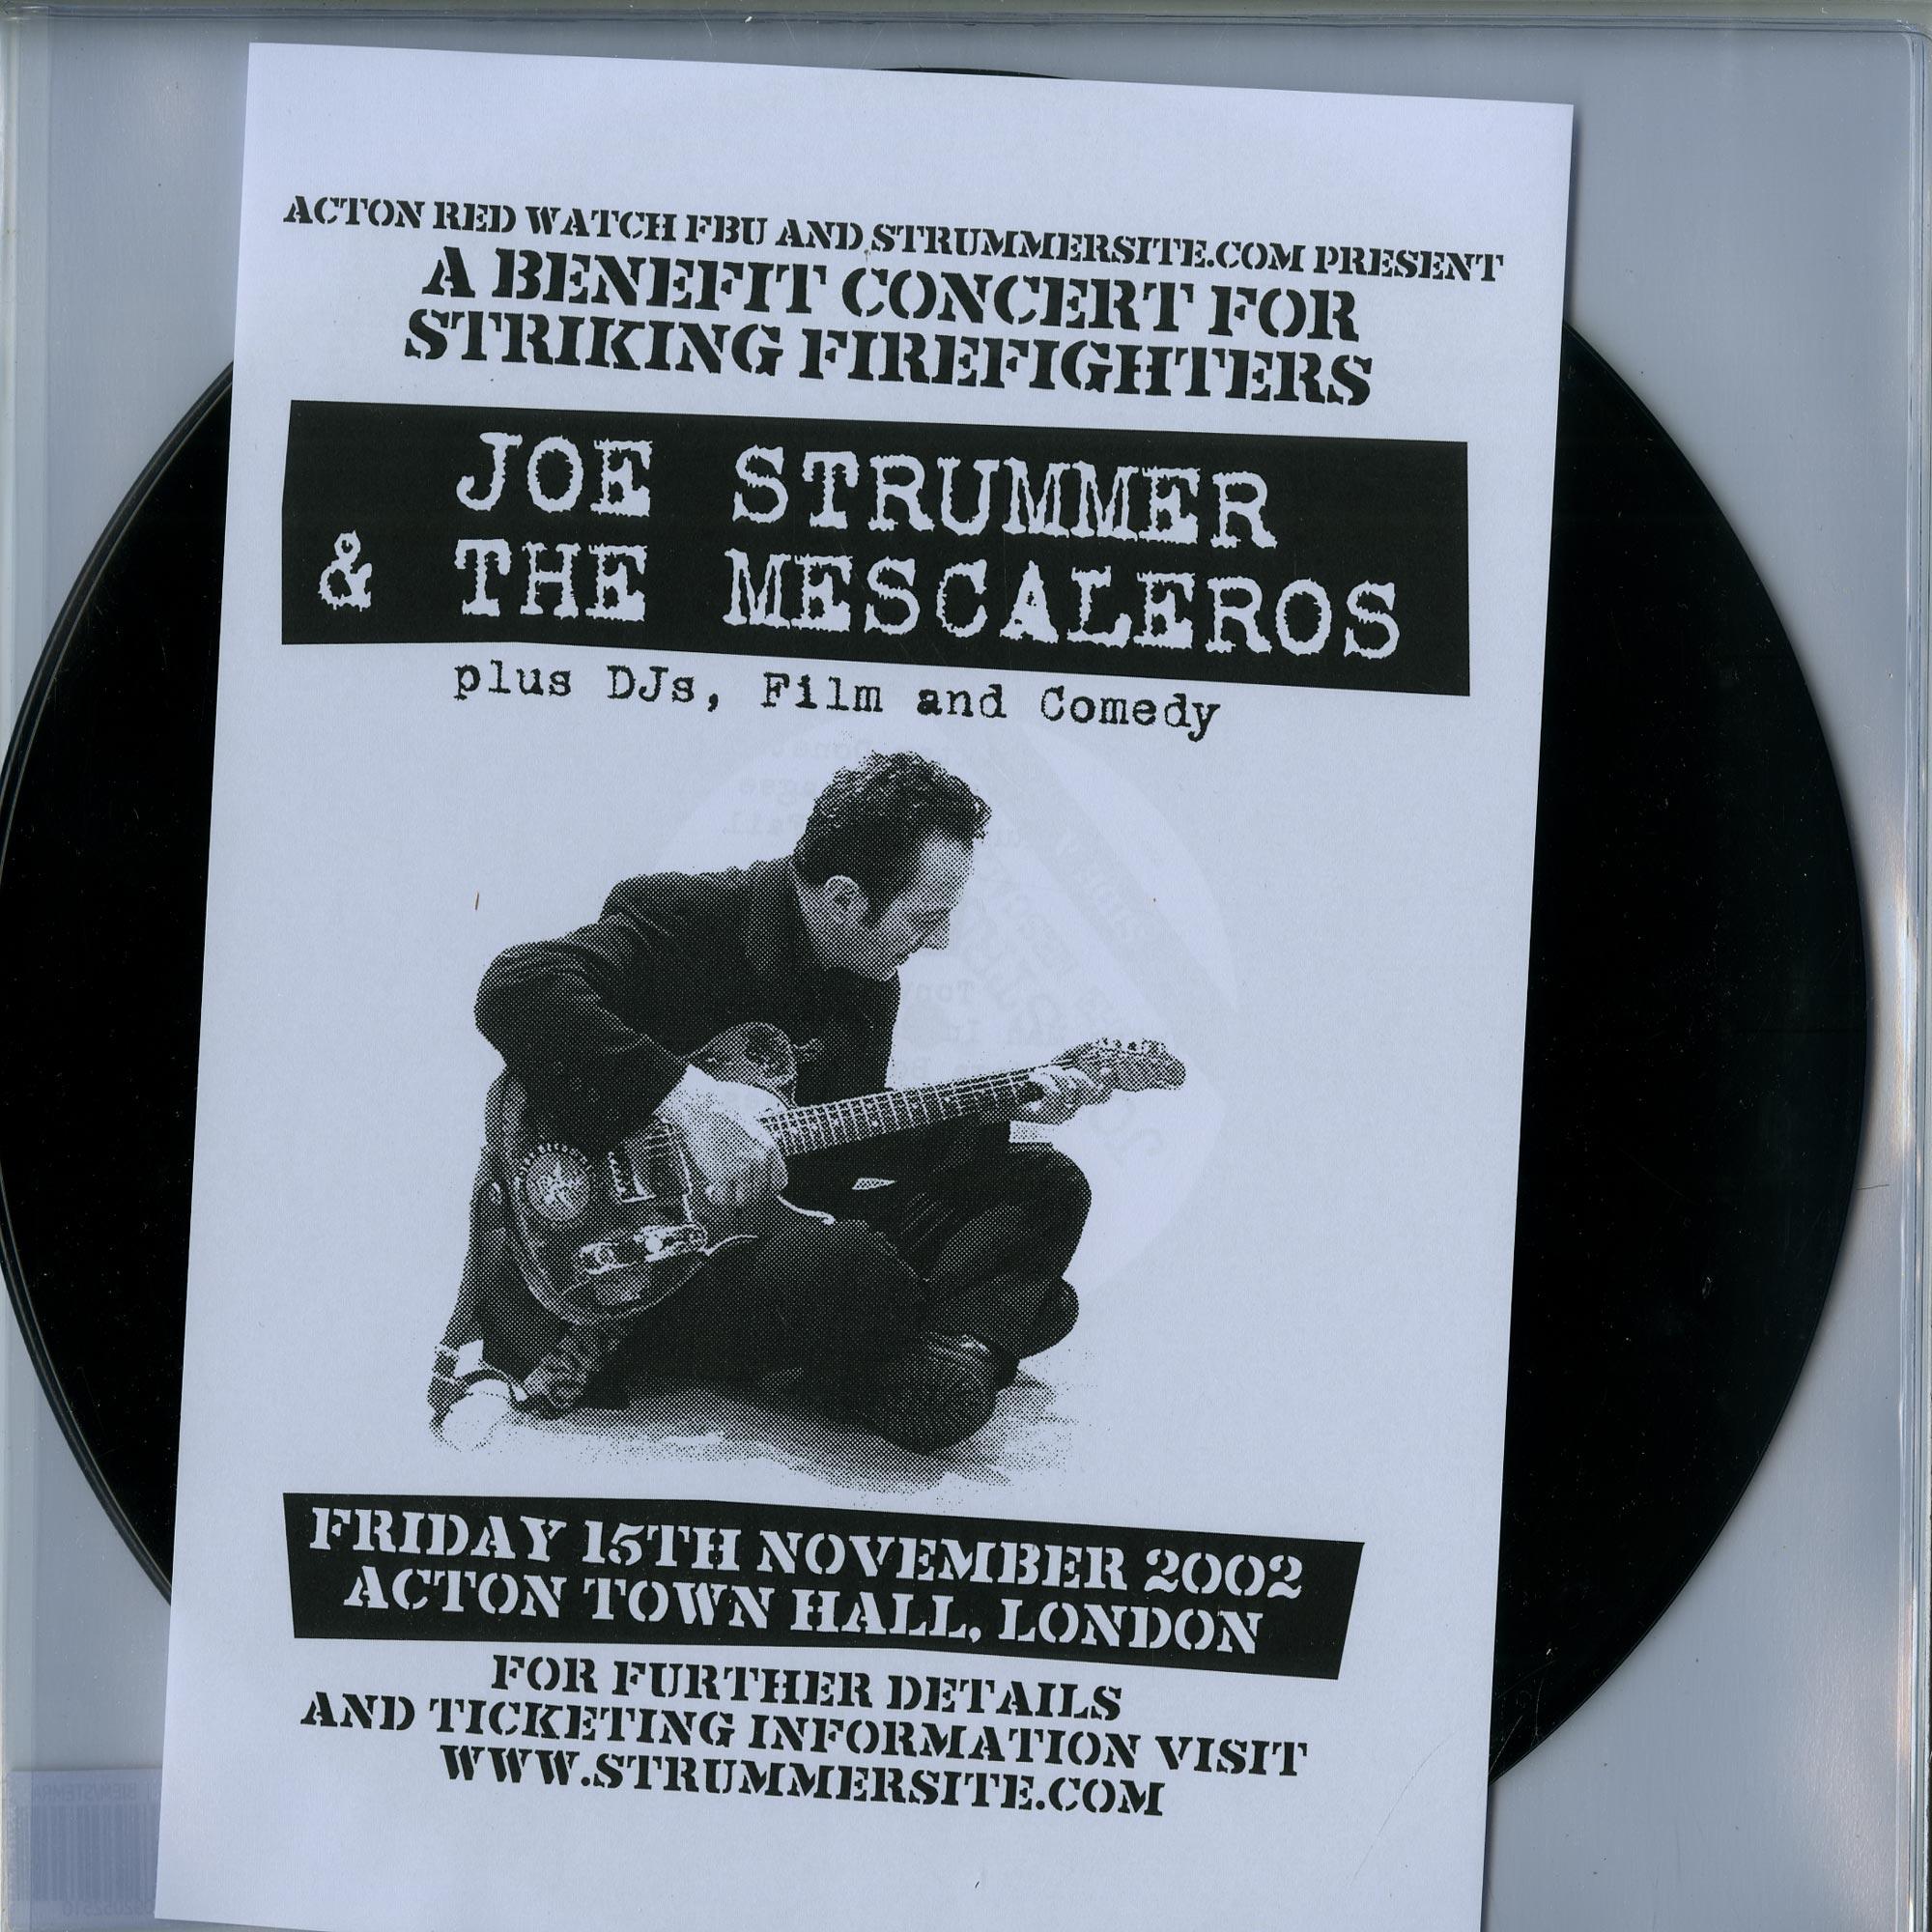 Joe Strummer & The Mescaleros - LIVE AT ACTON TOWN HALL, LONDON 2002